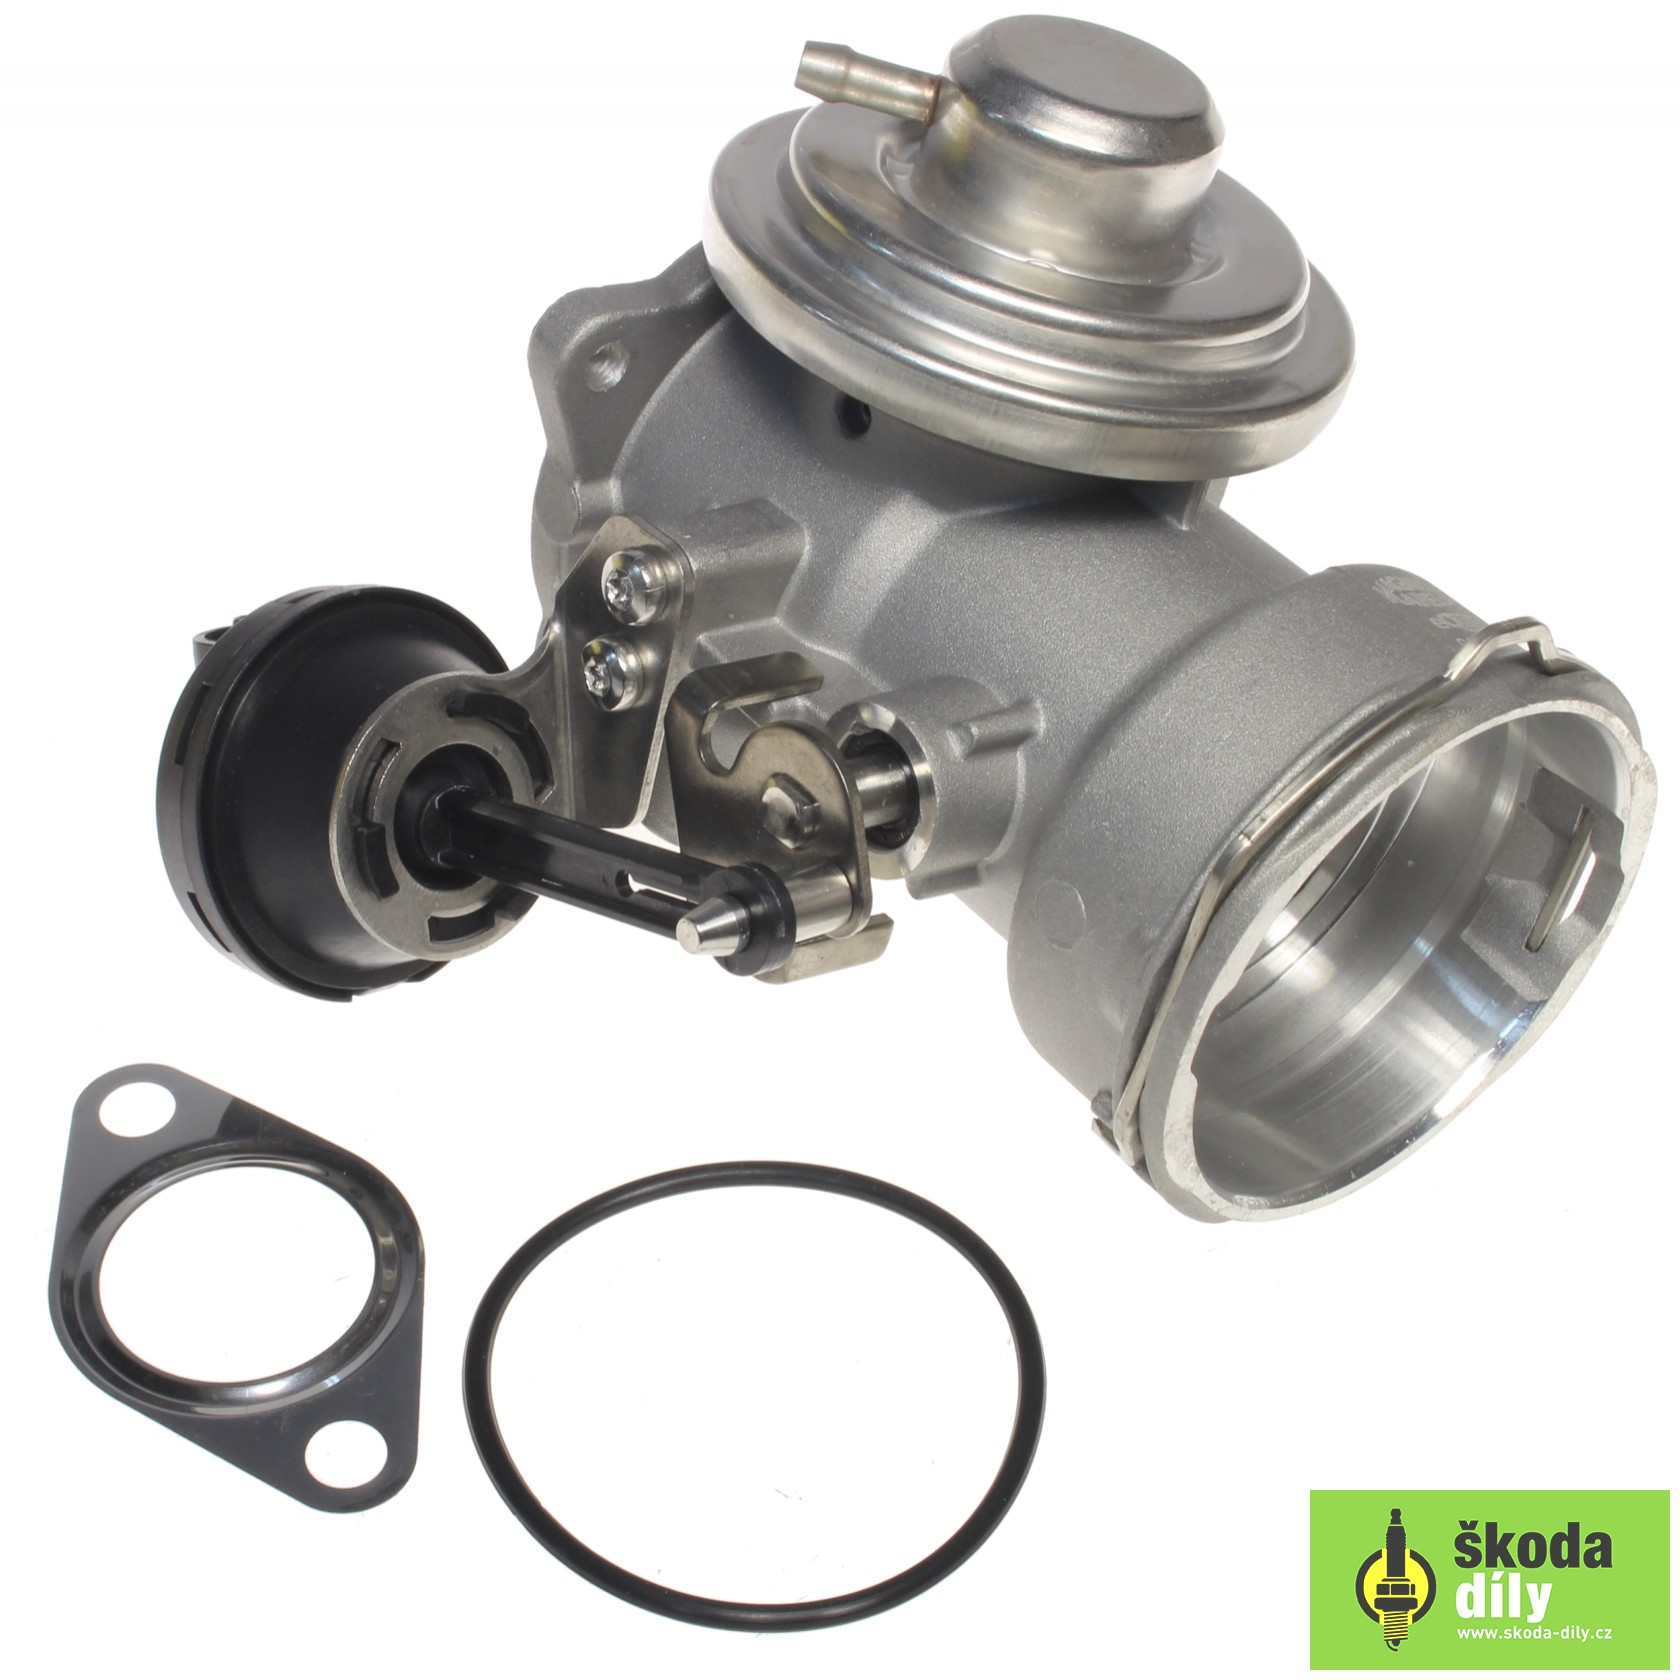 Skoda Octavia Engine Oil Capacity Skoda Workshop Manuals